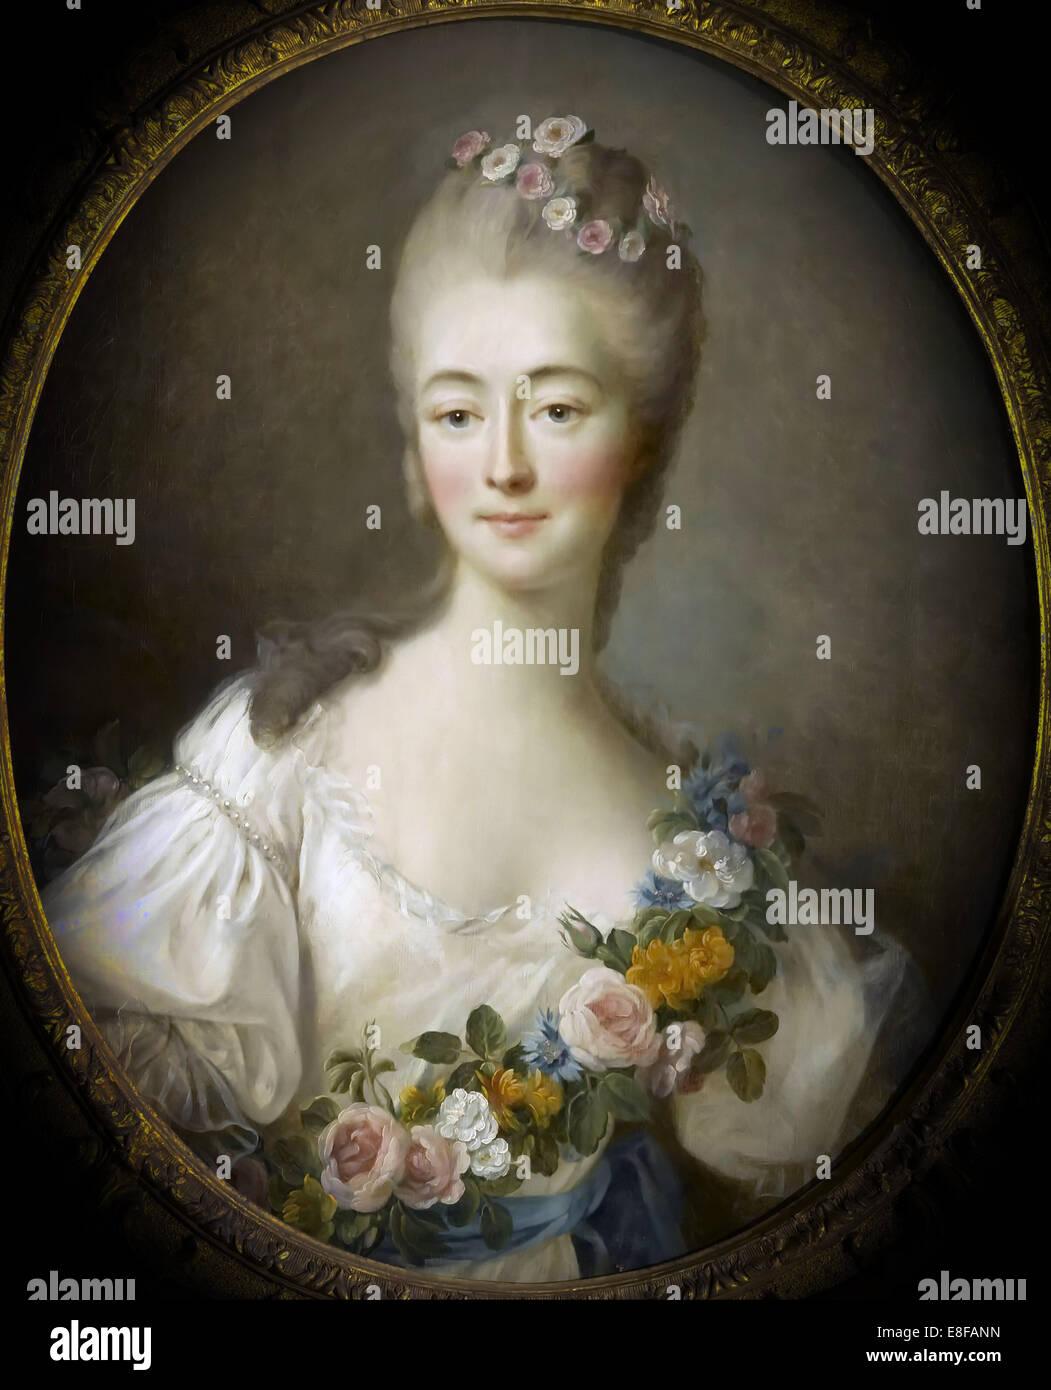 Jeanne Bécu, comtesse Du Barry (1743-1793) as Flora. Artist: Drouais, François-Hubert (1727-1775) - Stock Image